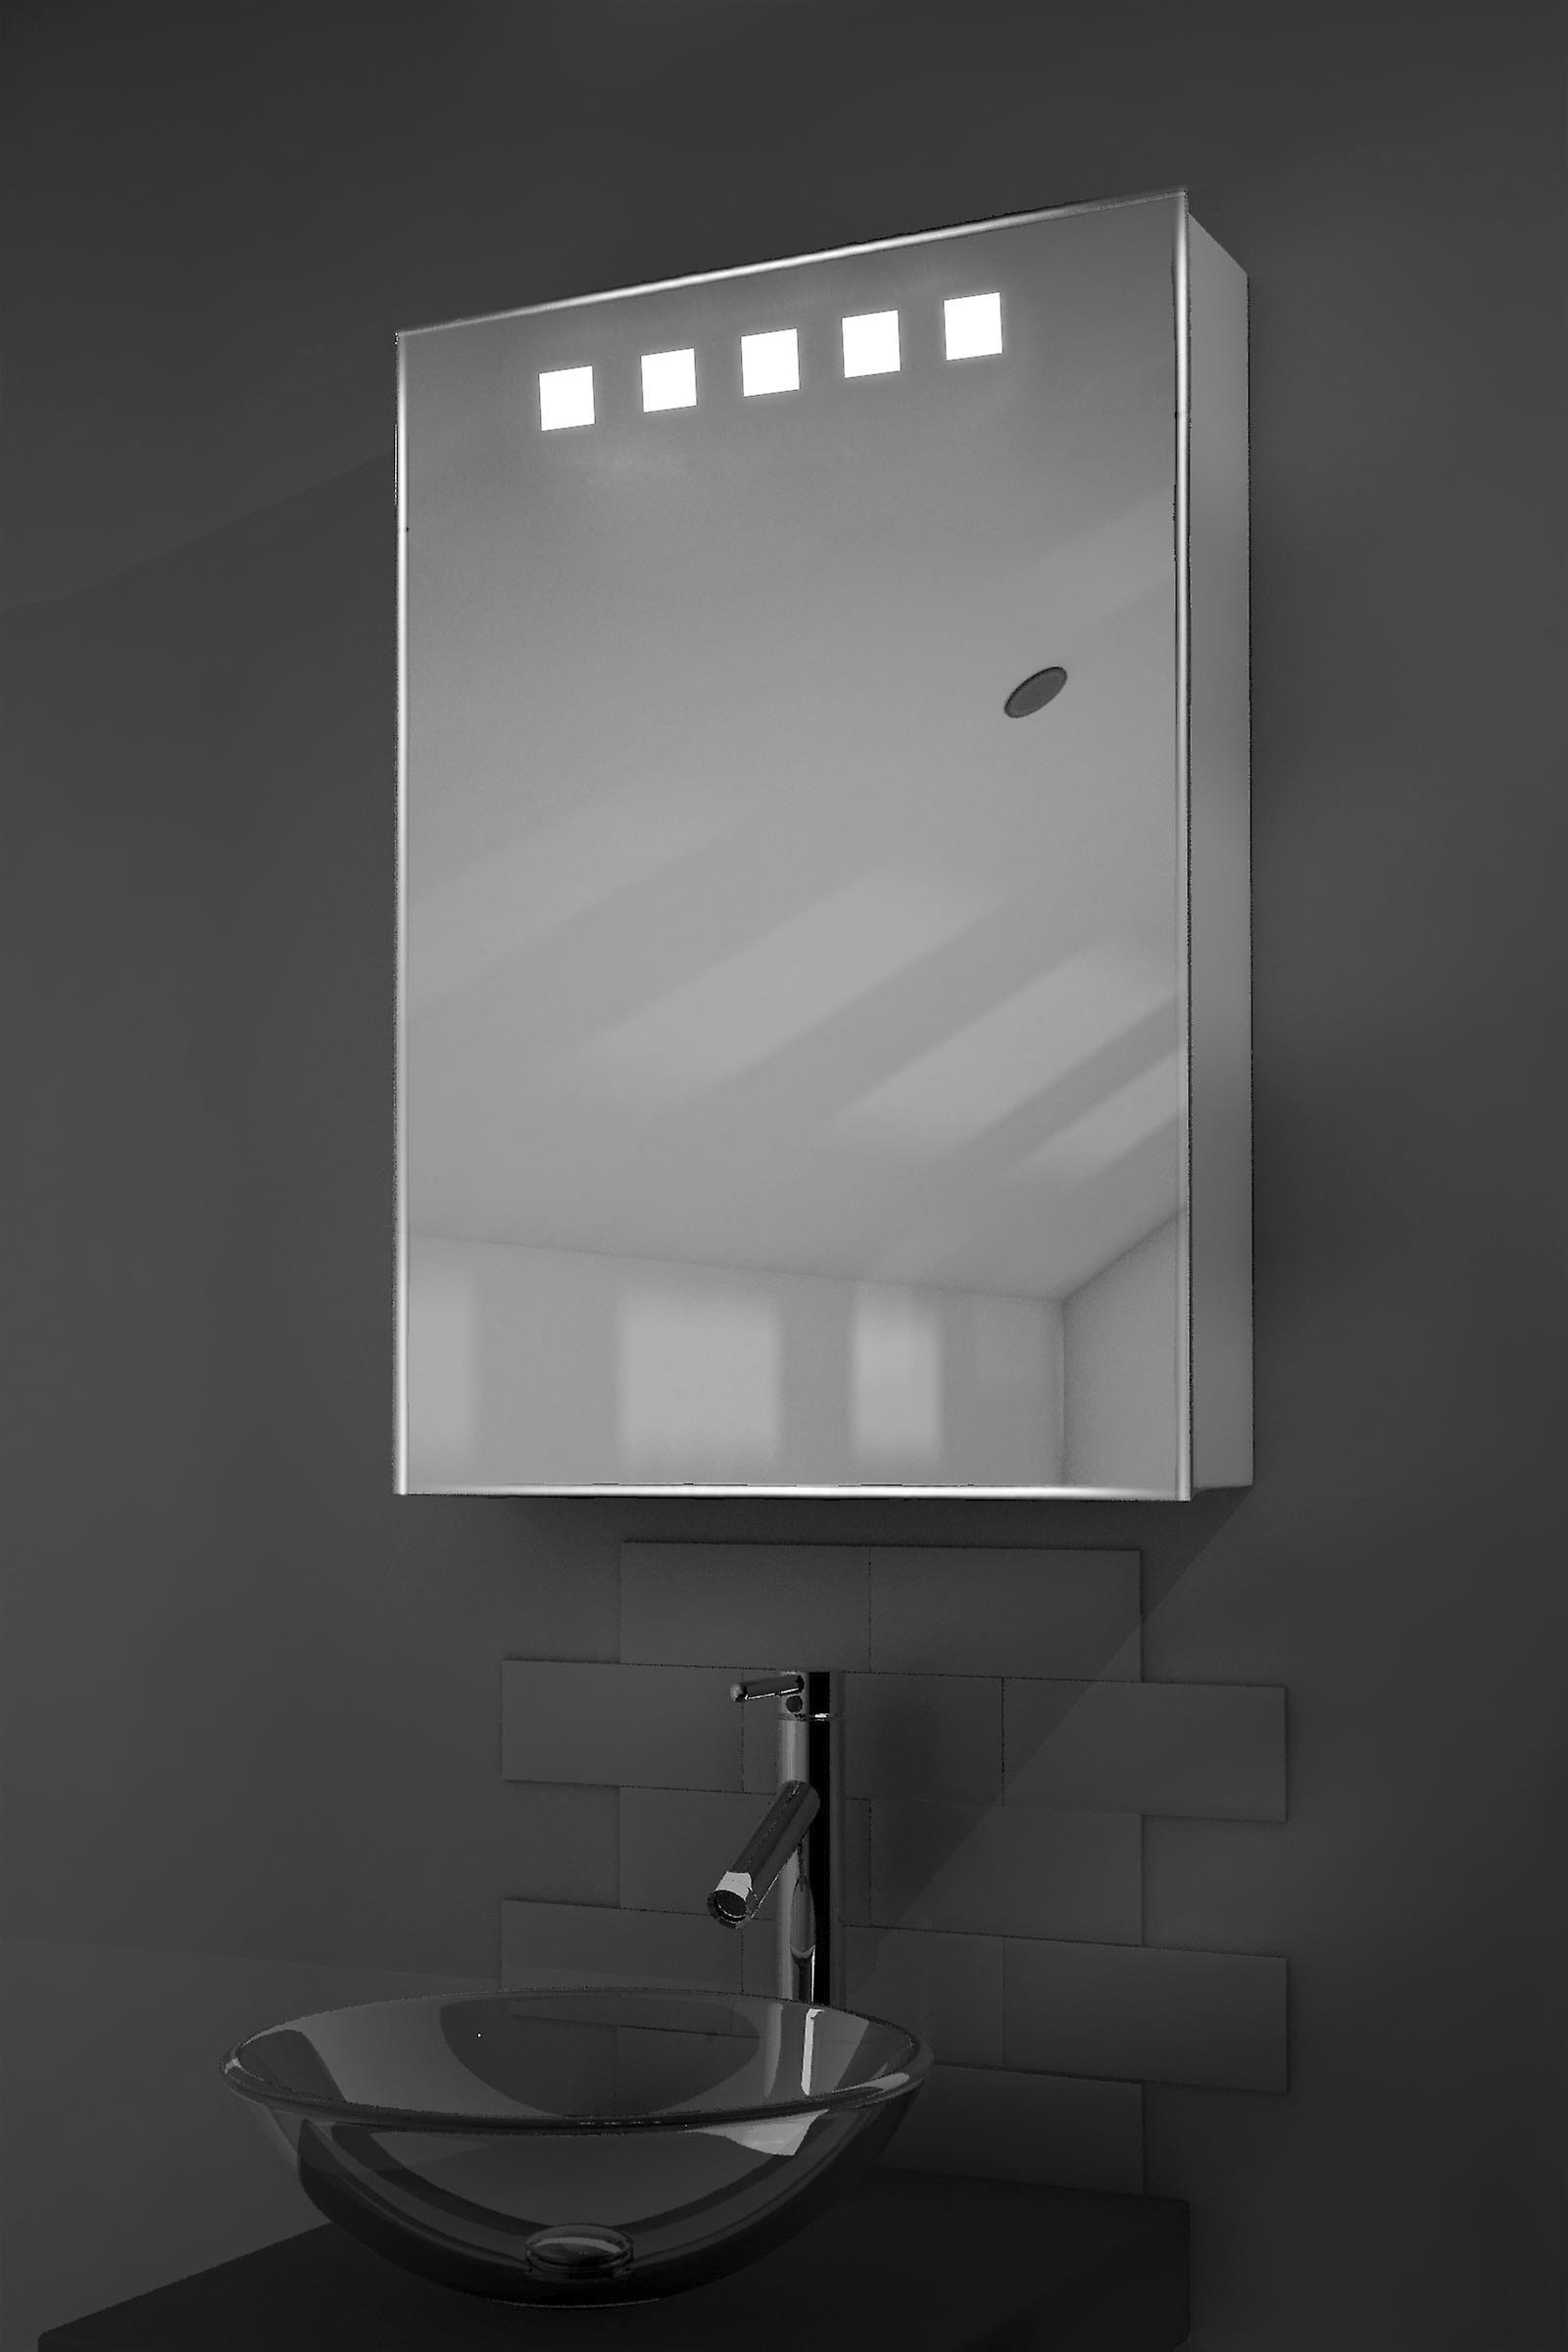 Deva LED lumineux salle de bain miroir armoire avec capteur & rasoir k259